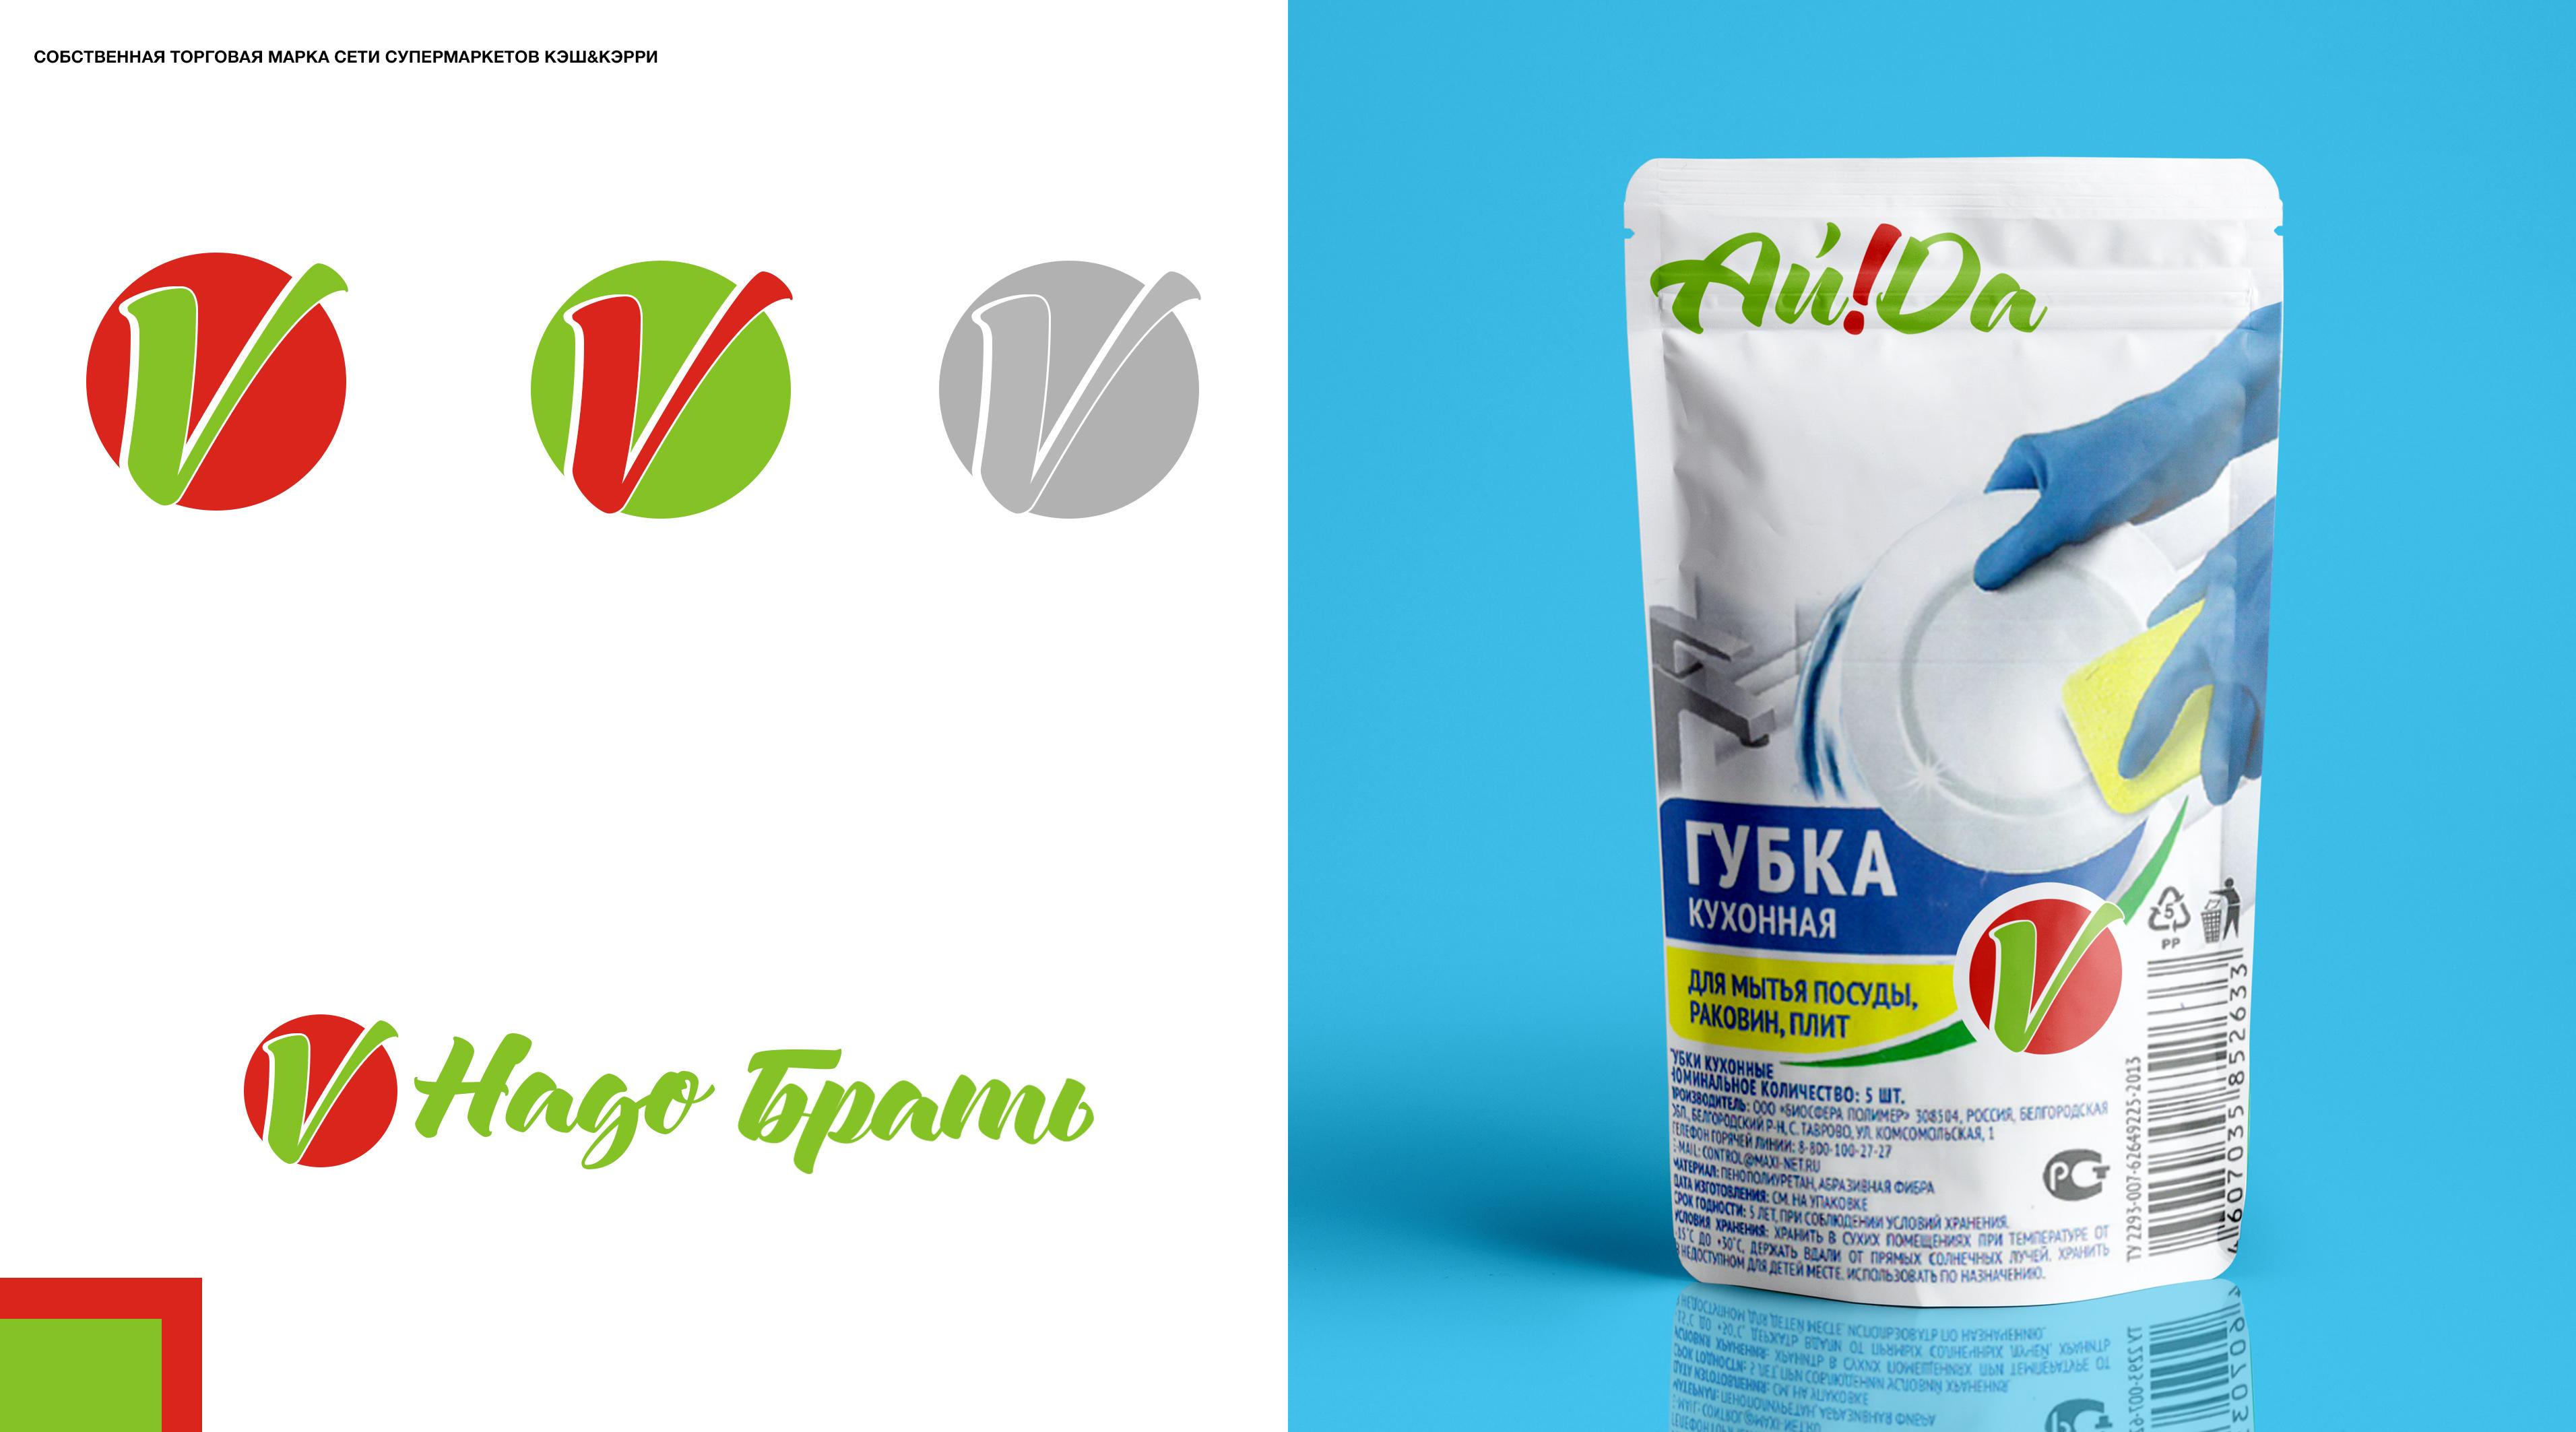 Дизайн логотипа и упаковки СТМ фото f_4785c58b8dea1eb4.jpg